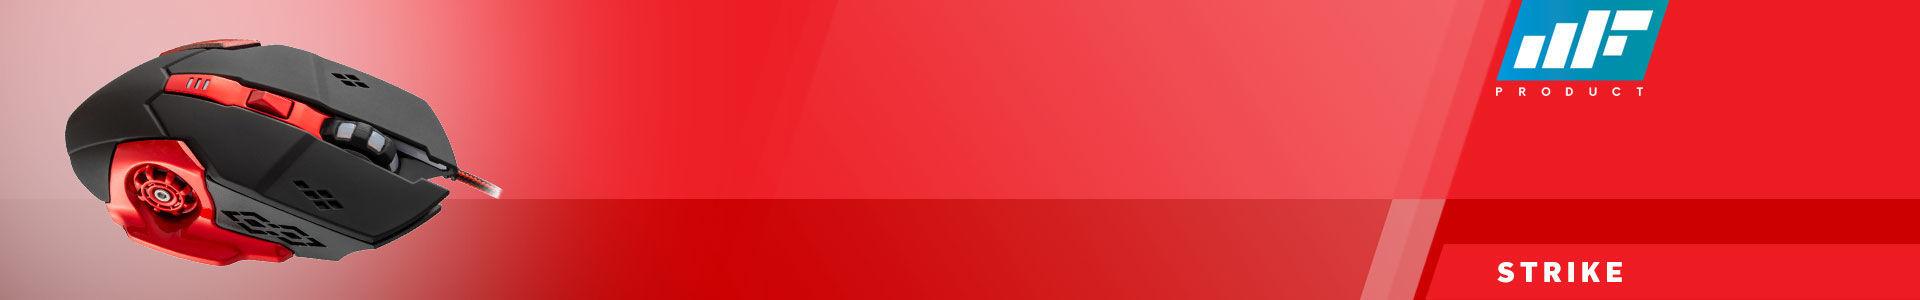 MF Product Strike 0110 Kablolu Rgb Gaming Mouse + Mouse Pad Kırmızı tam da buradan alınır!